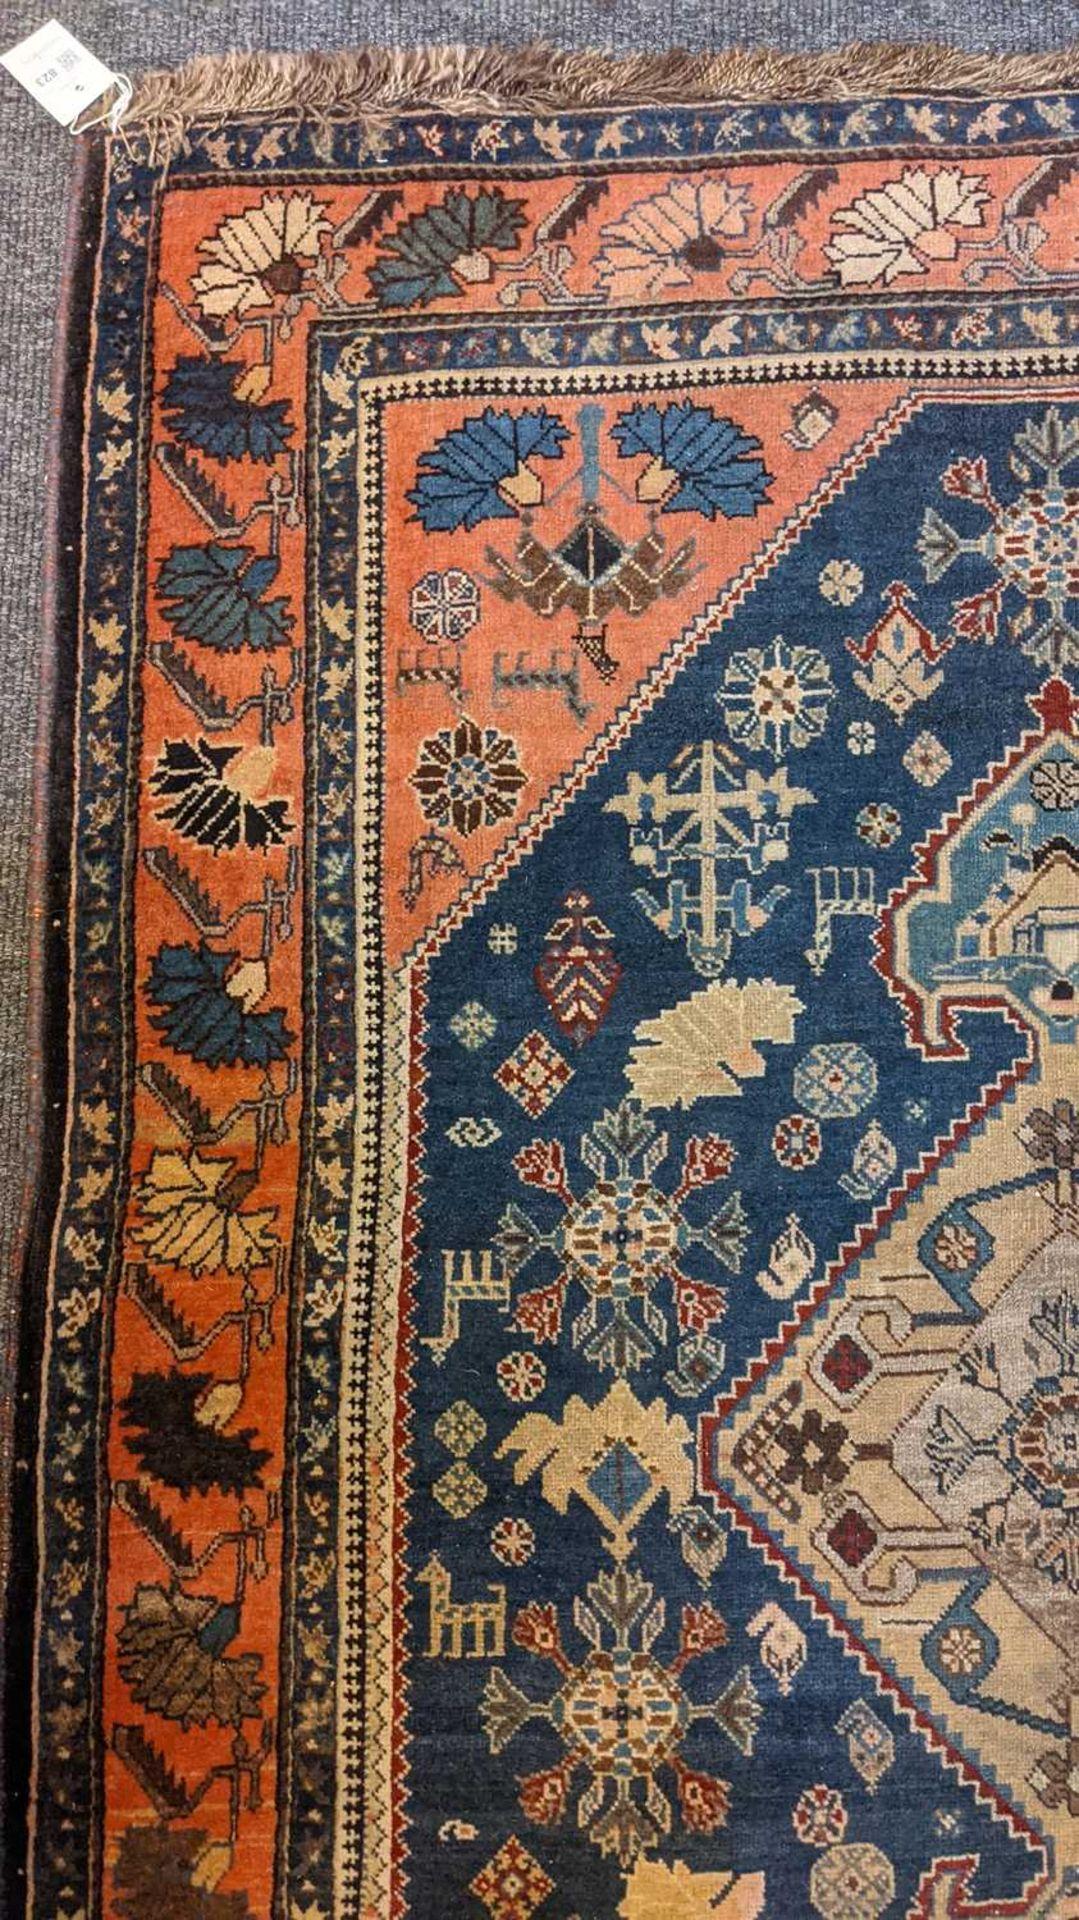 An Afghan Beshir rug, - Image 16 of 17